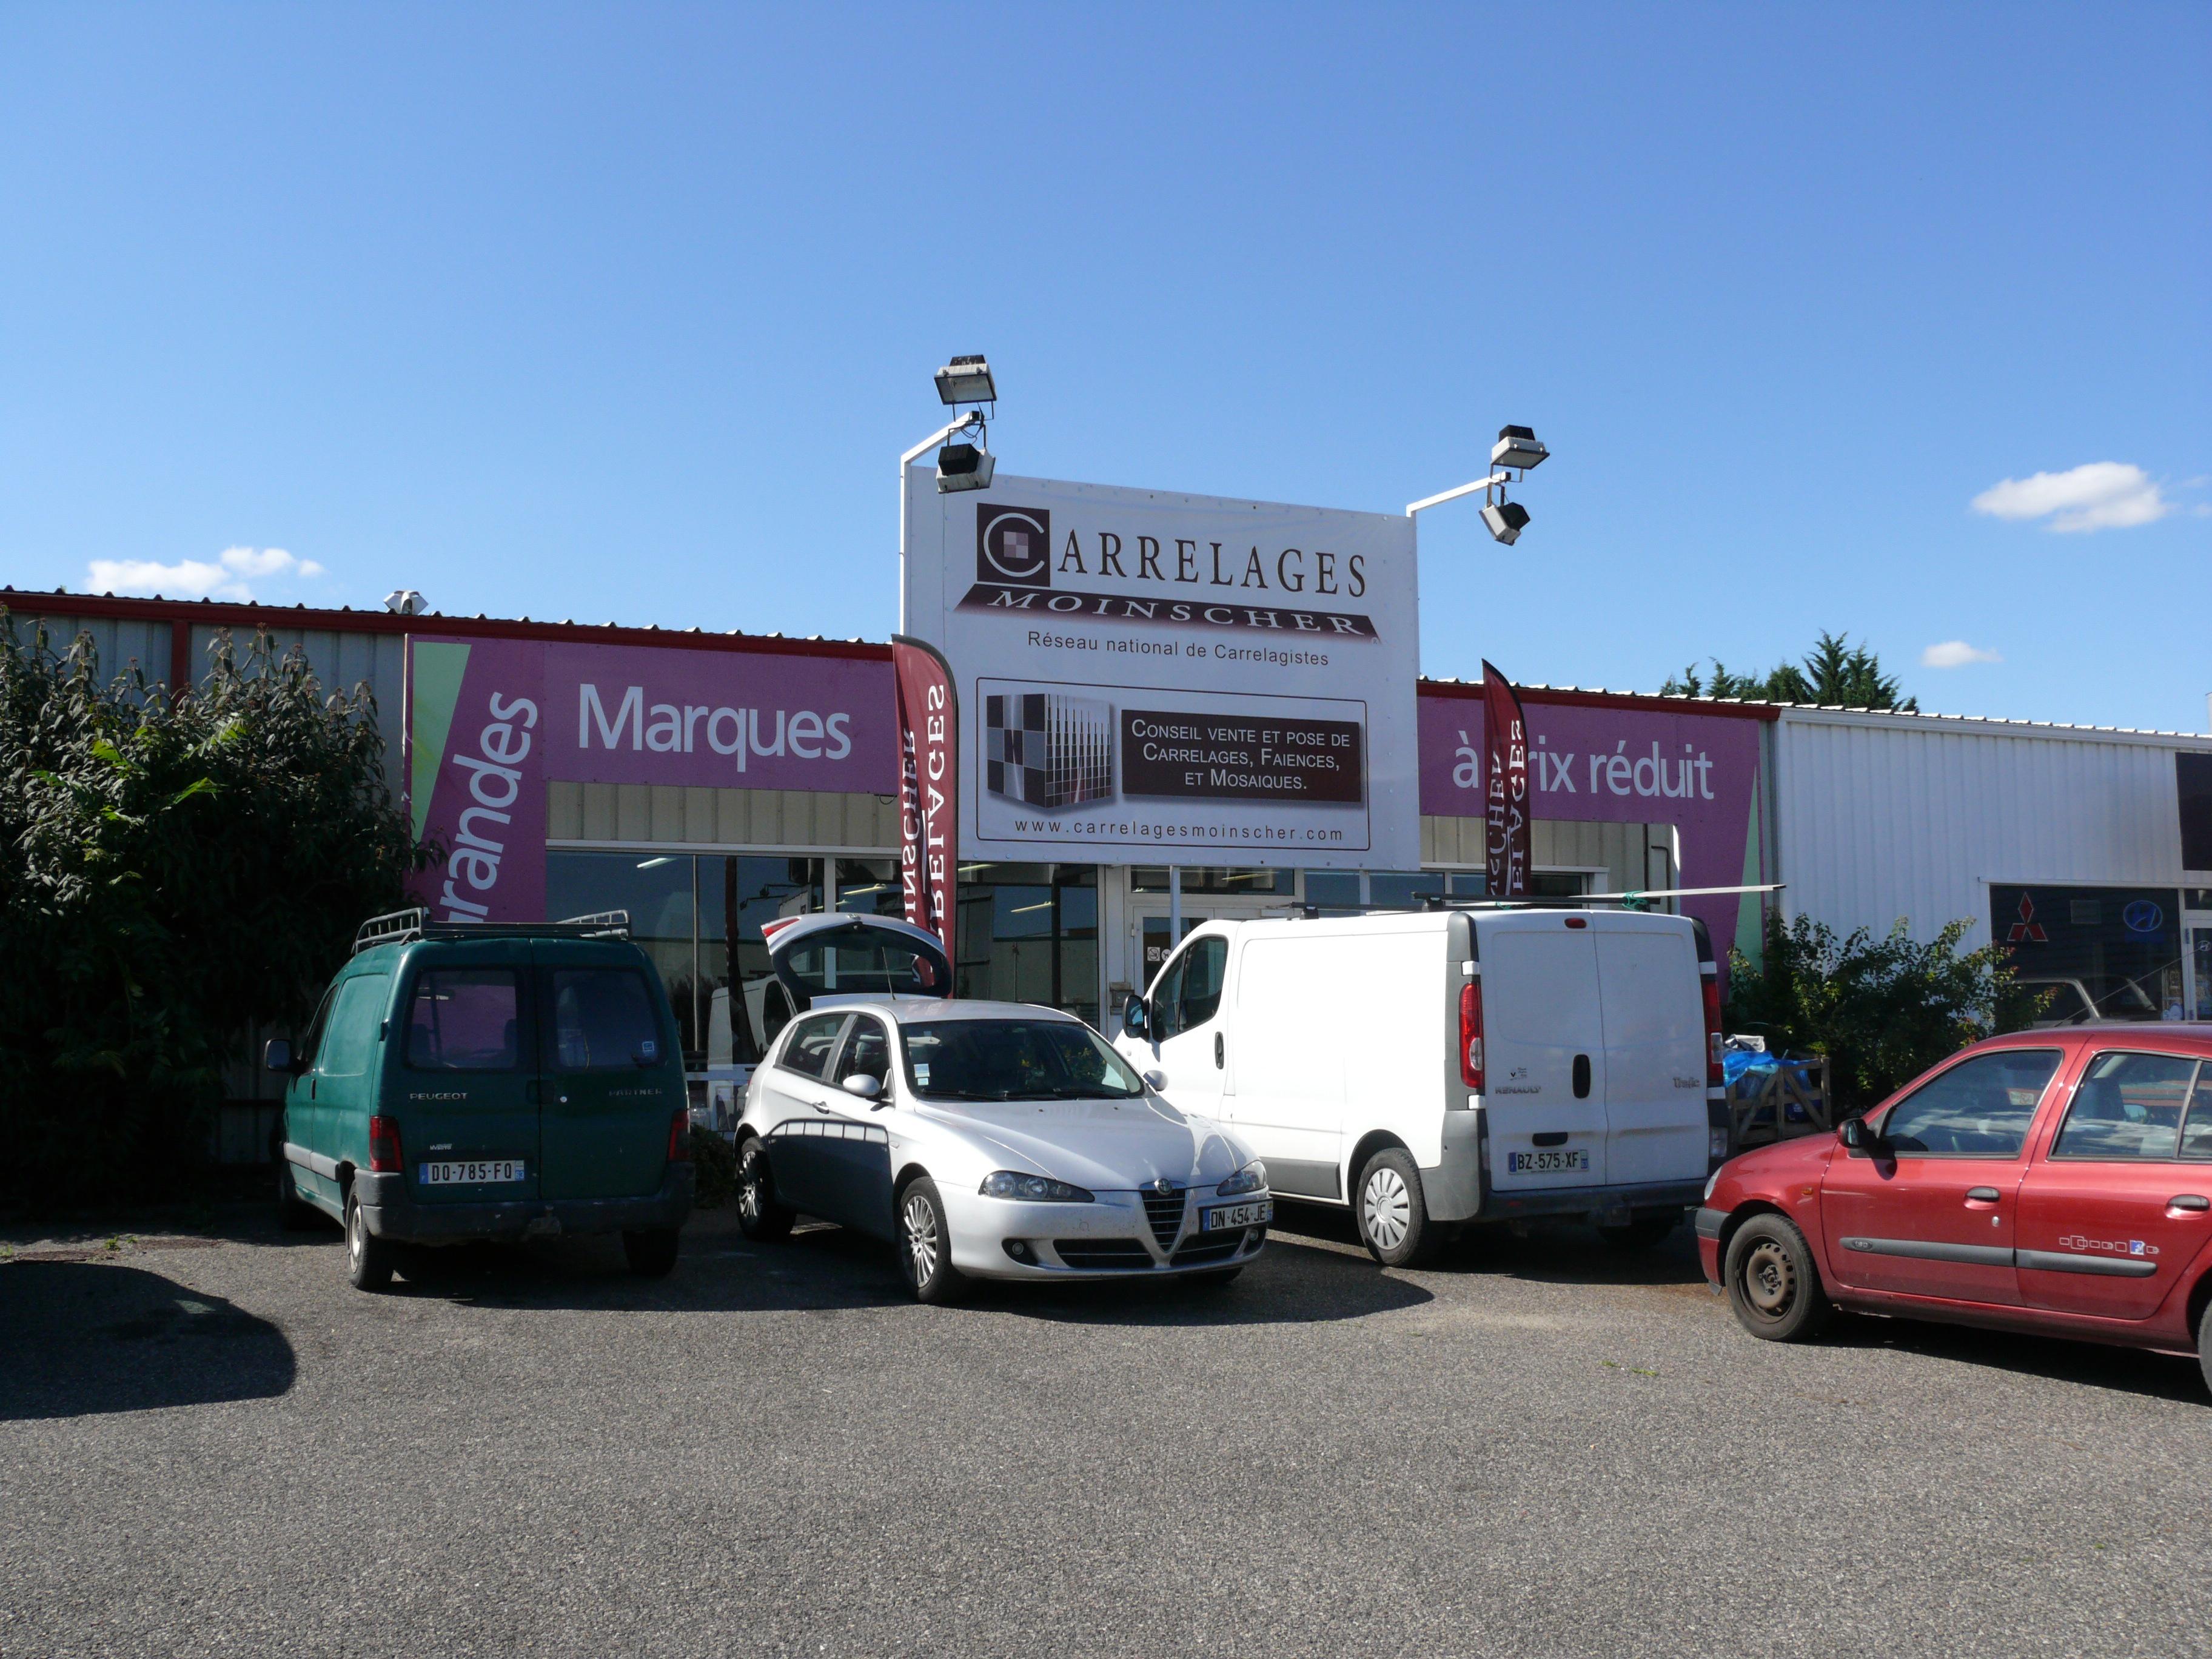 Carrelage Design carrelage clermont ferrand : magasin de carrelage u00e0 Cournon du0026#39;auvergne